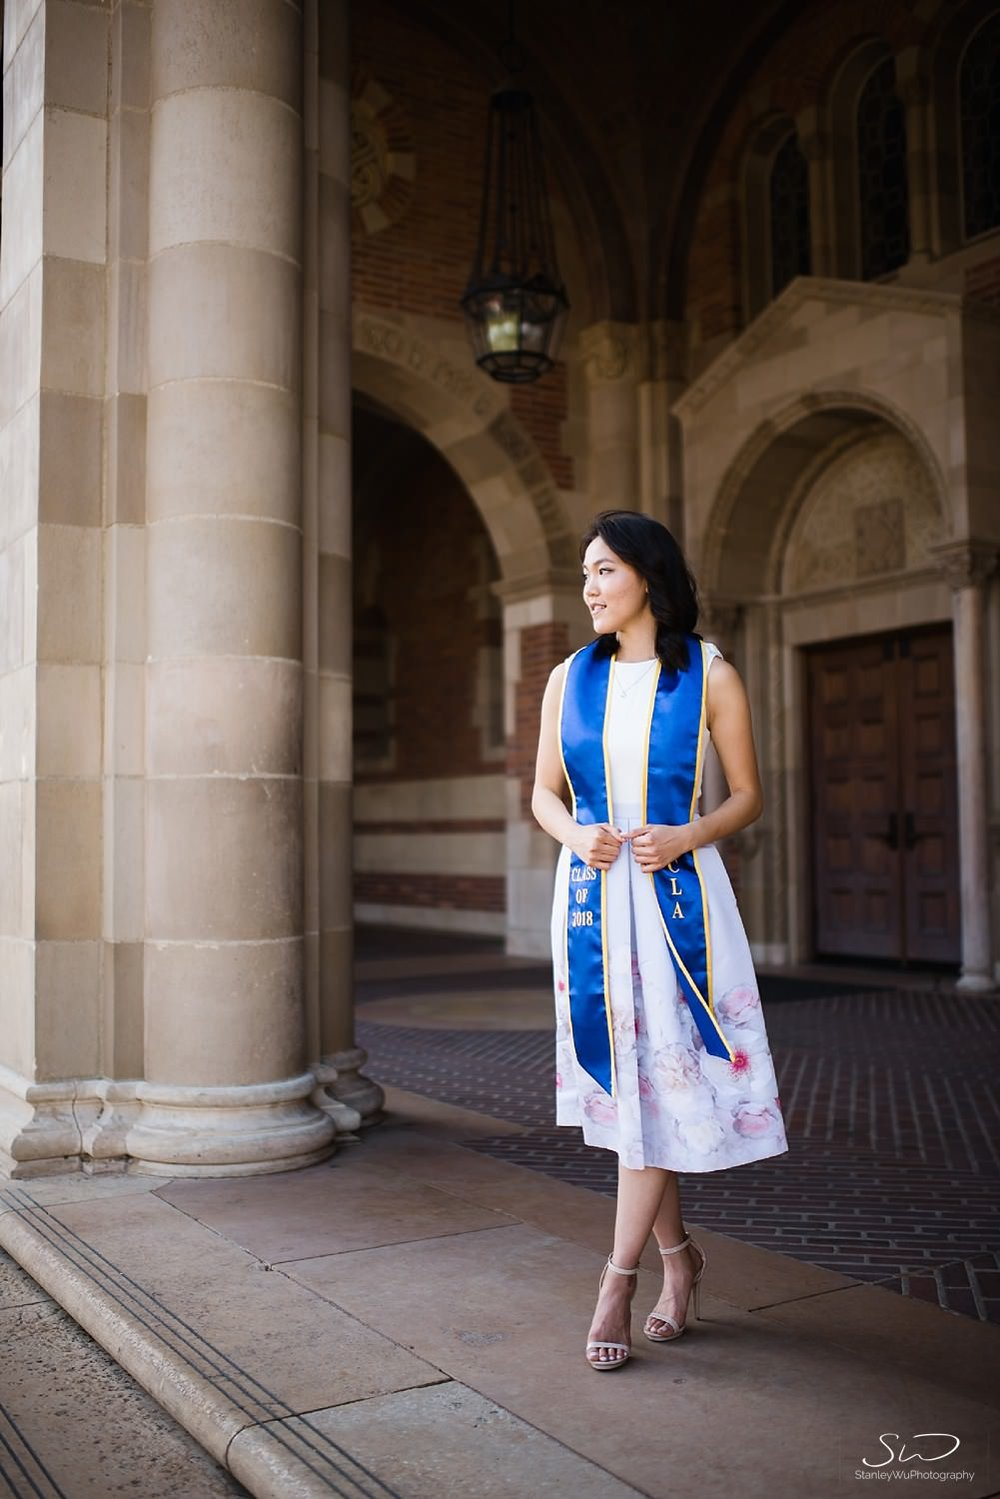 ucla-fashion-graduation-portrait-senior-session_0068.jpg